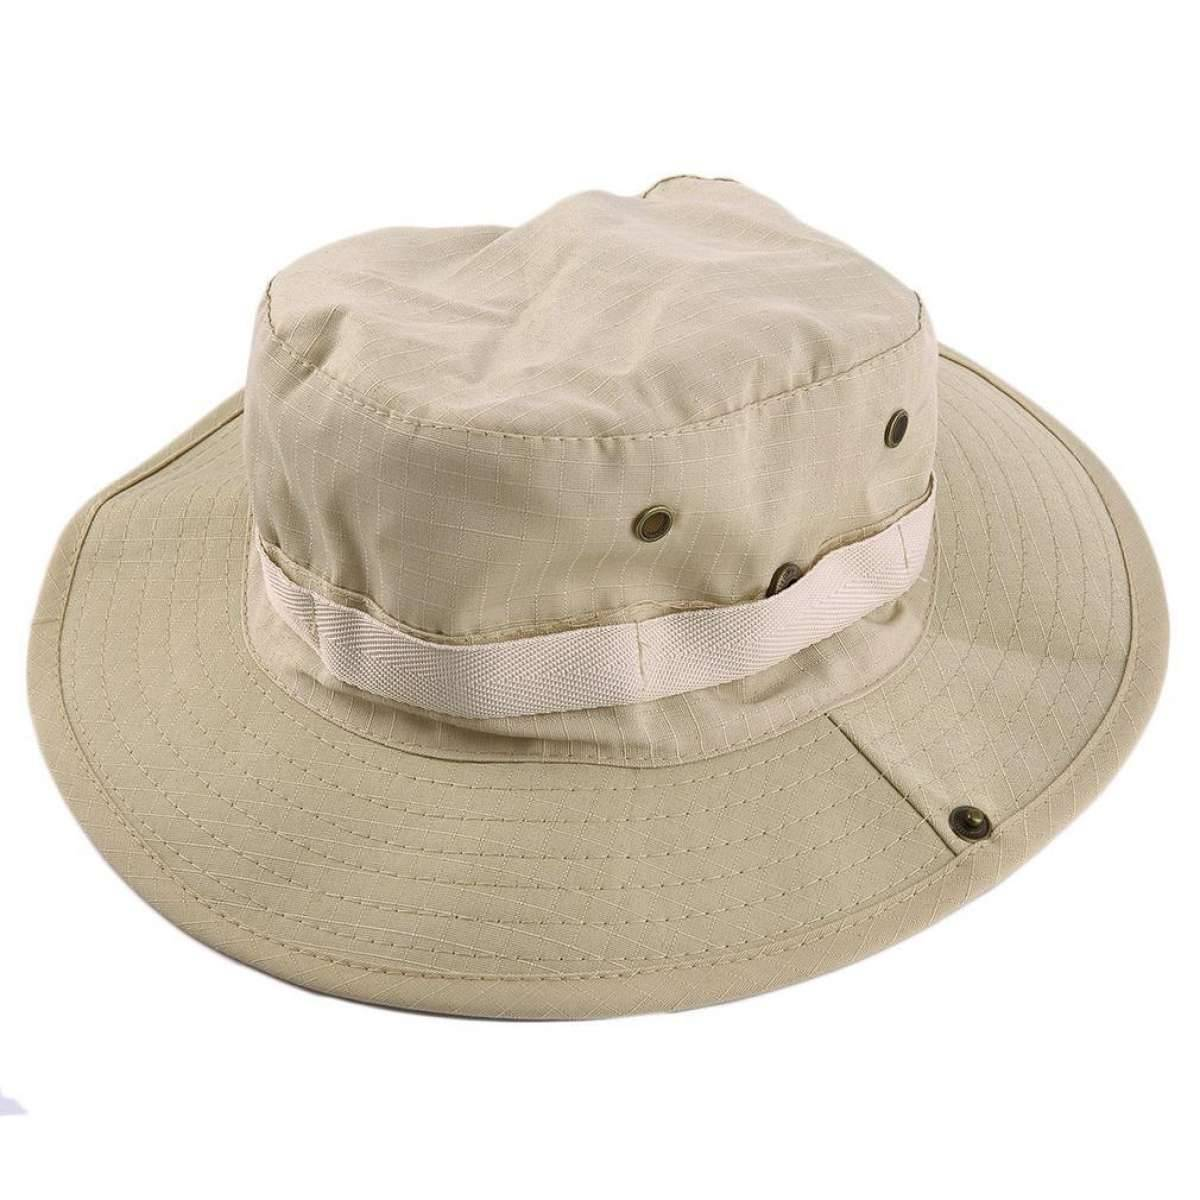 Waterproof Outdoor Wide Brim Sun Hat, Fishing Hiking Sun Boonie Hat for Men & Women